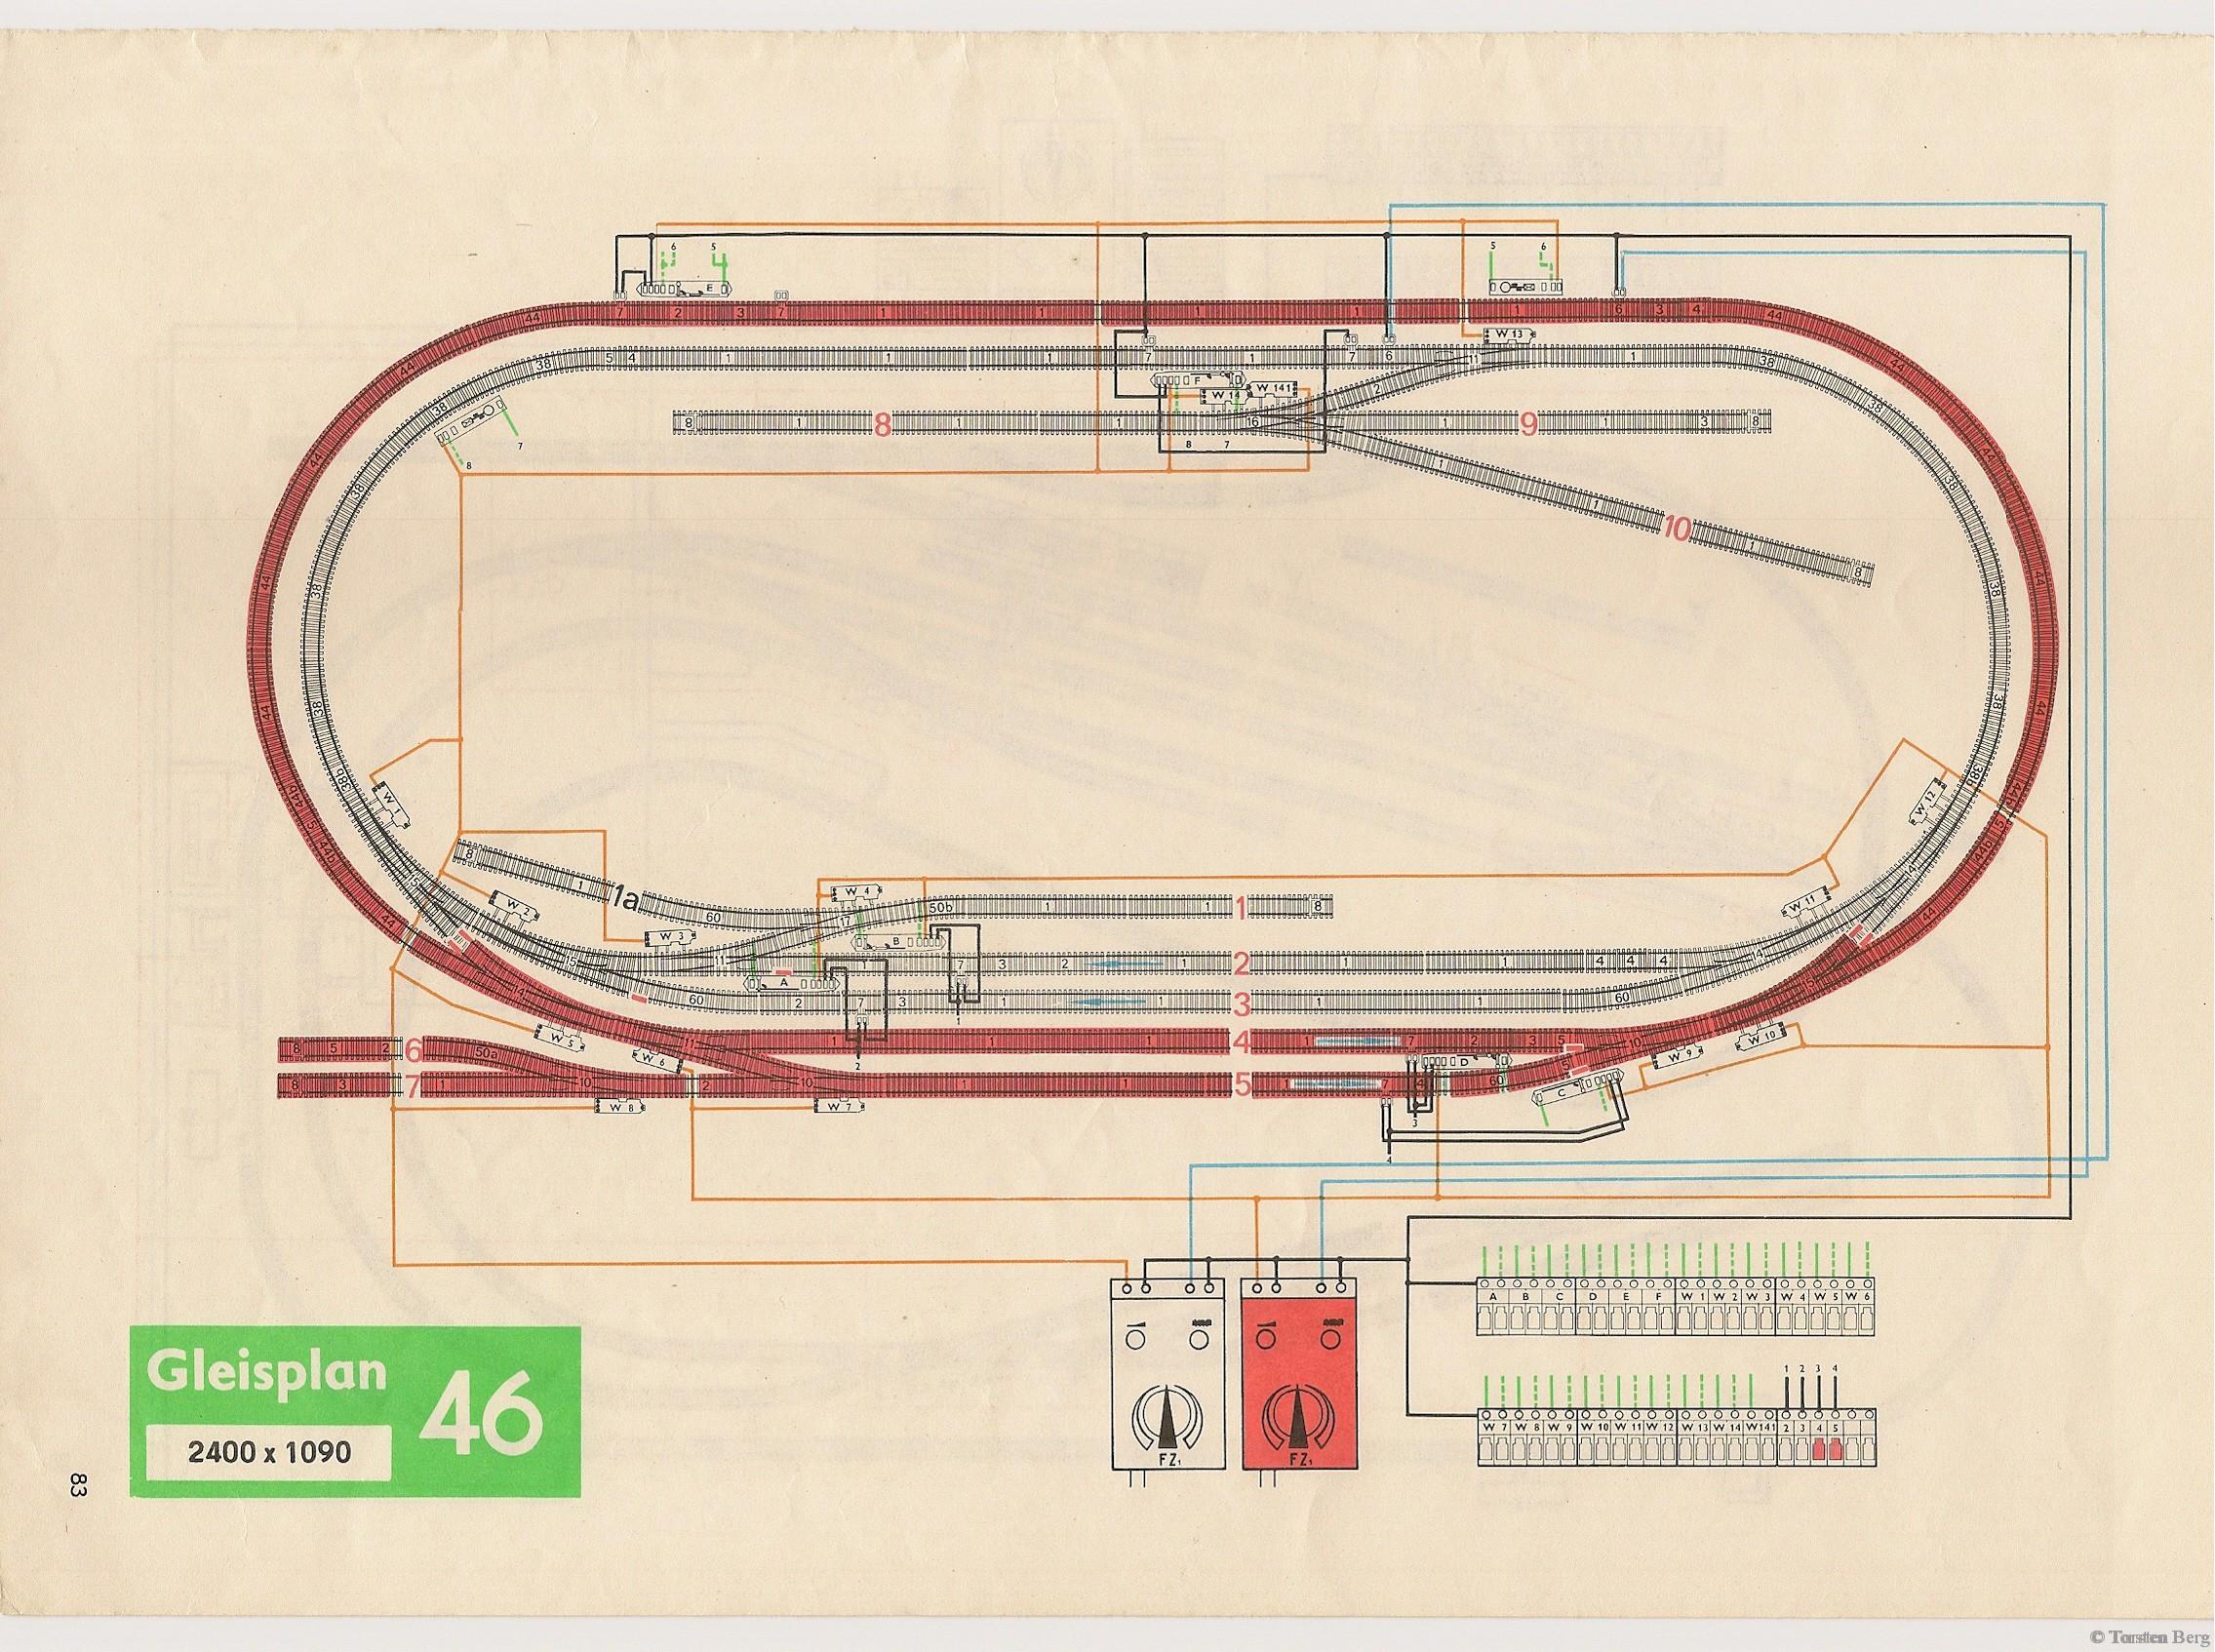 84 PIKO Standardgleis-Gleisplan 46